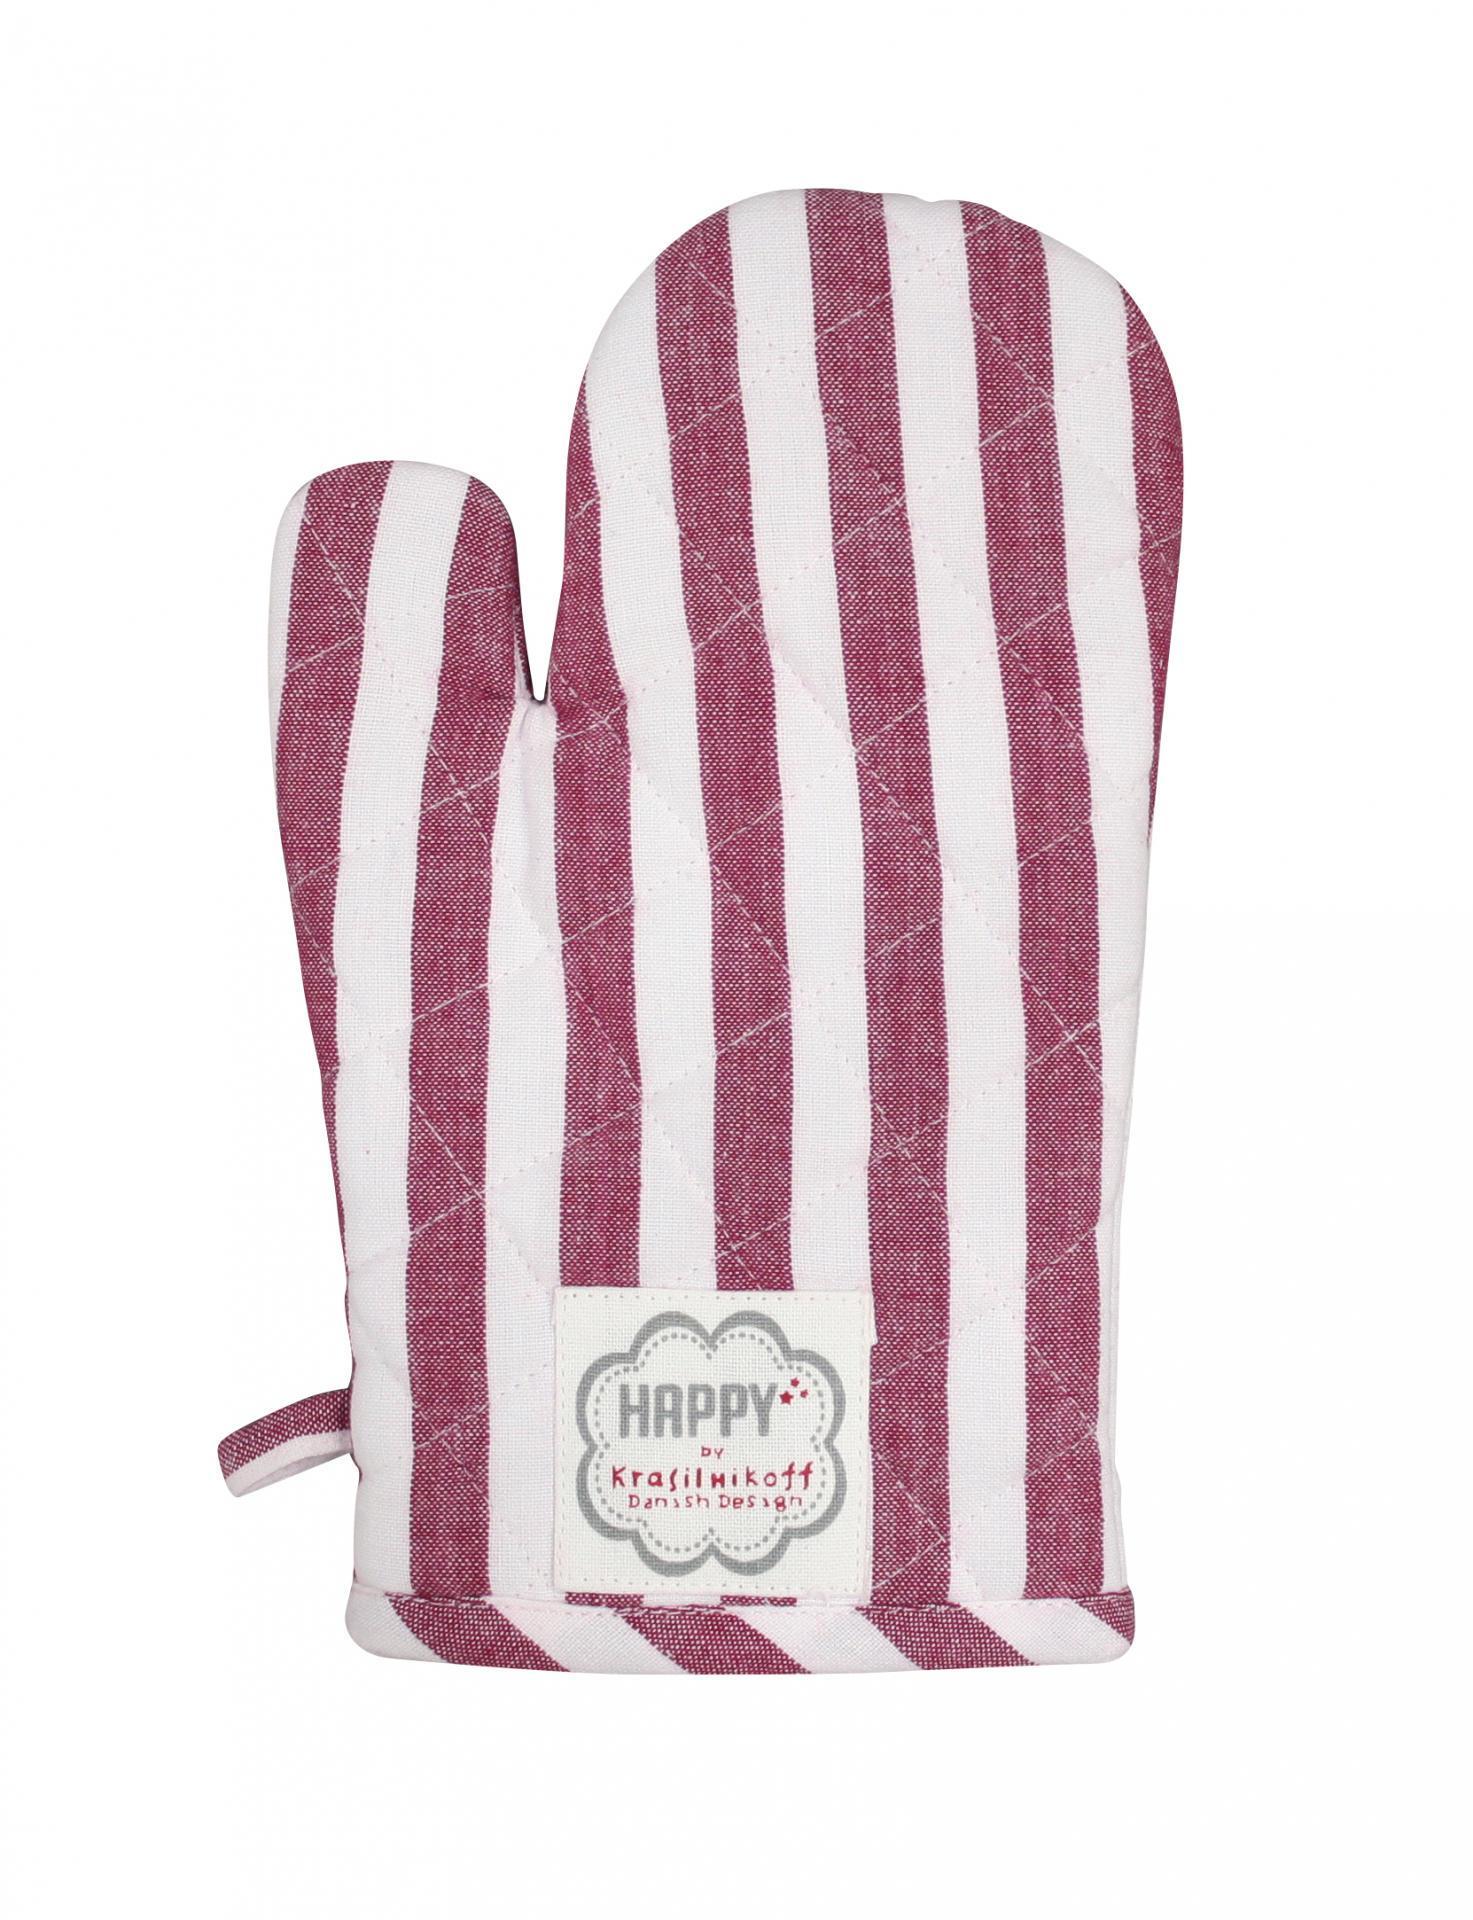 Krasilnikoff Chňapka Plum Stripes, růžová barva, fialová barva, textil